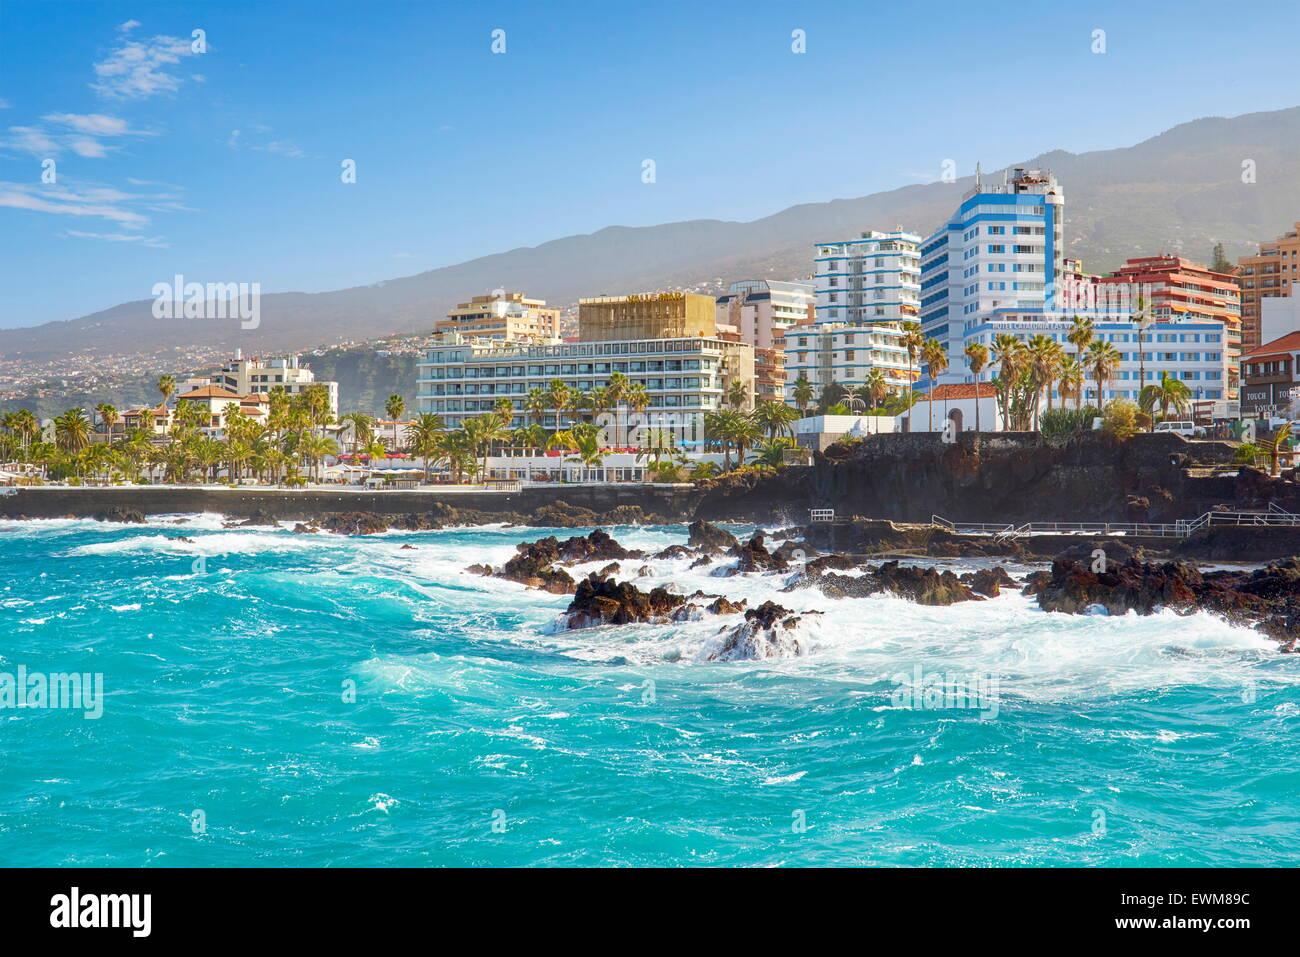 Puerto De La Cruz, Teneriffa, Kanarische Inseln, Spanien Stockfoto